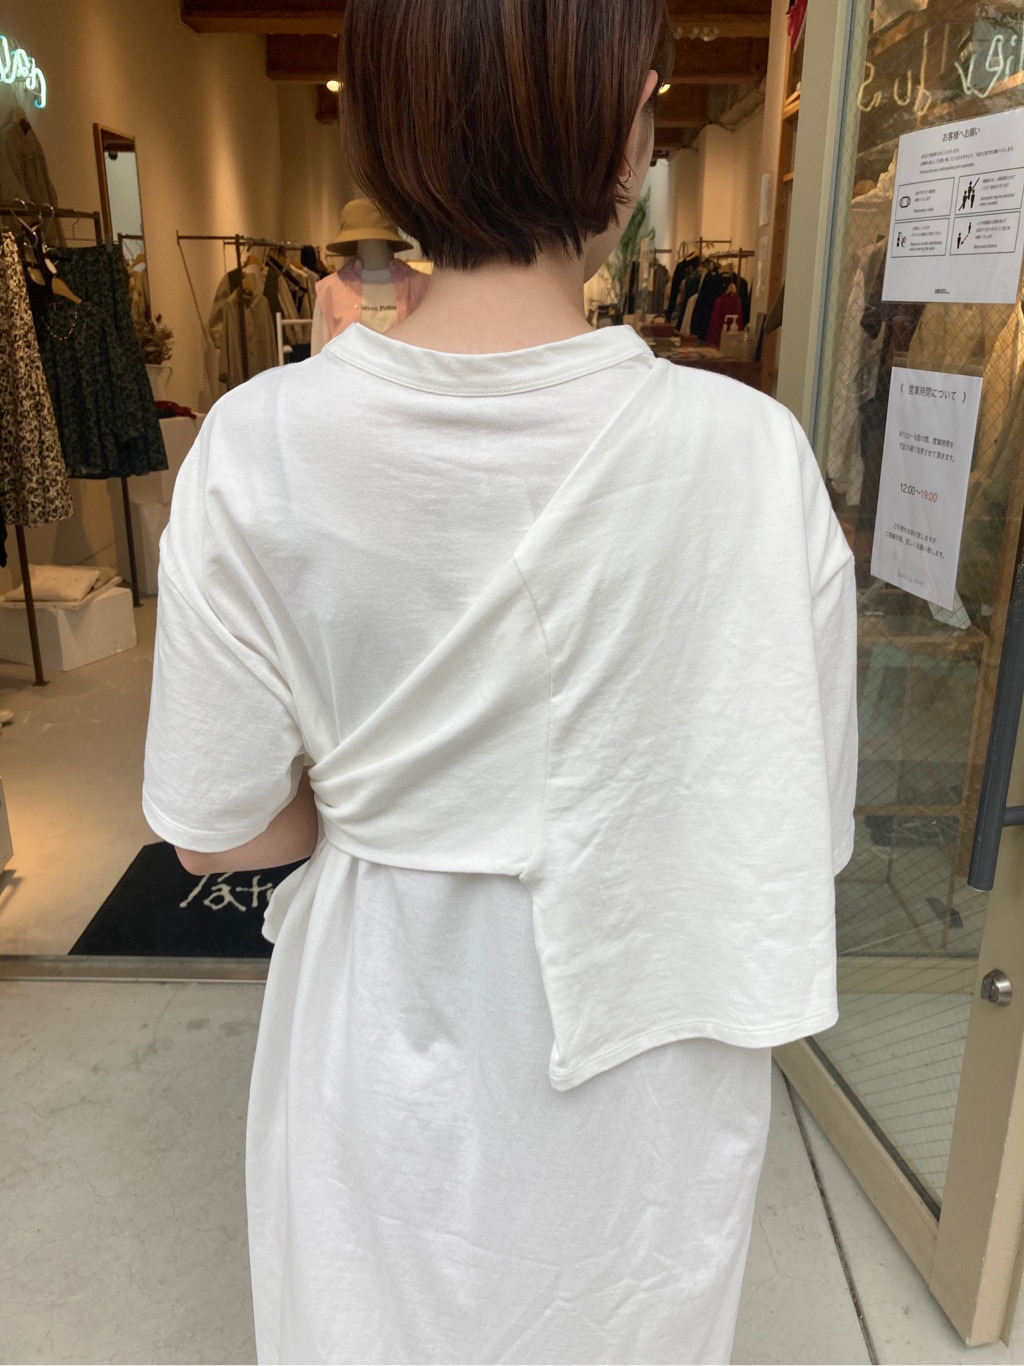 l'atelier du savon 名古屋栄路面 身長:161cm 2020.09.12